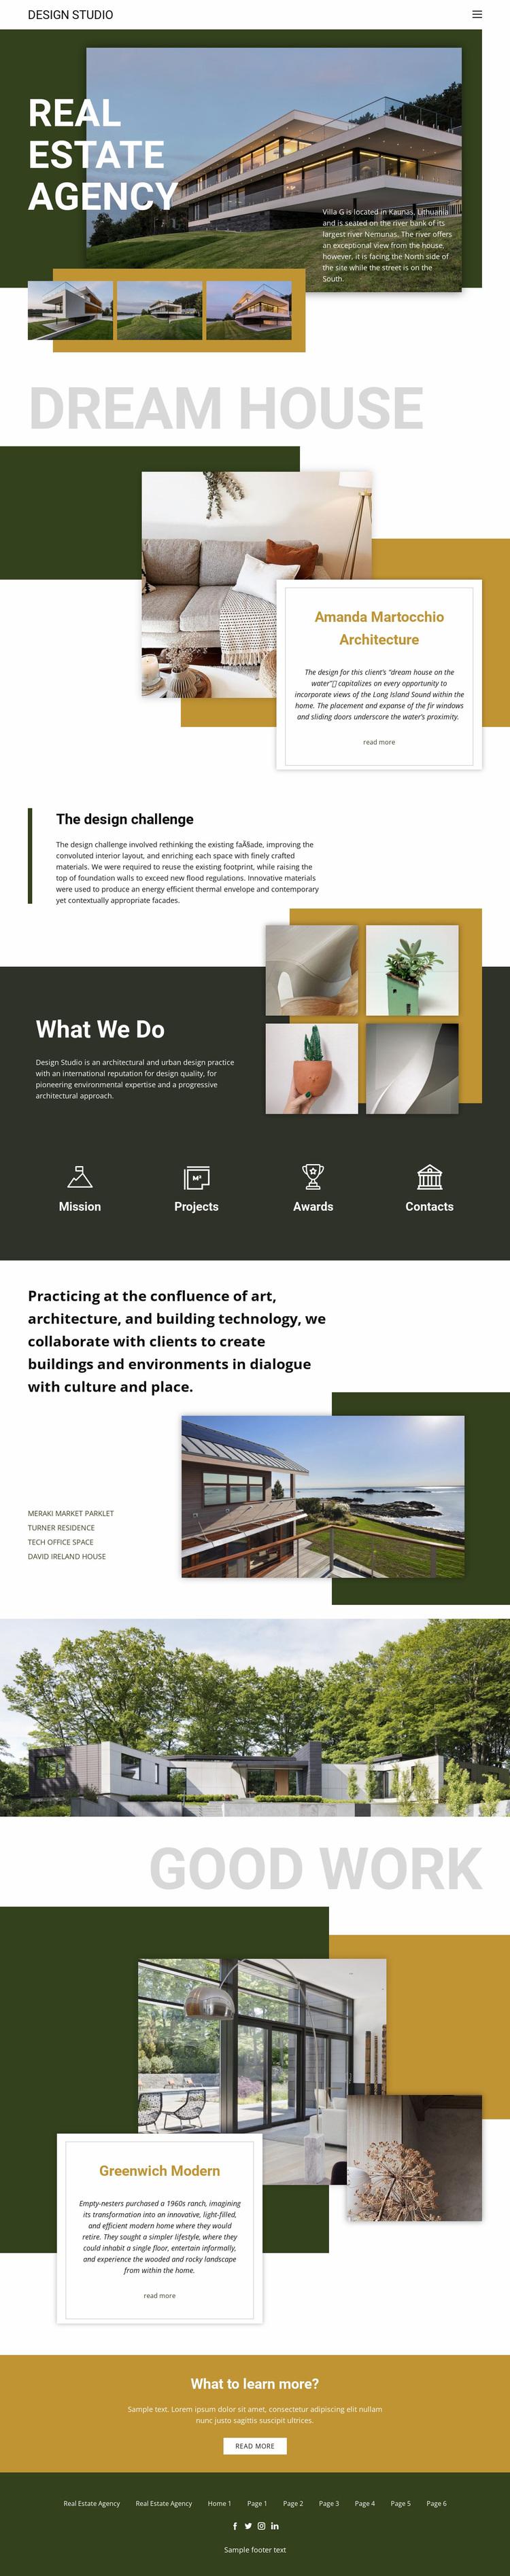 Dream real estate agency Website Design